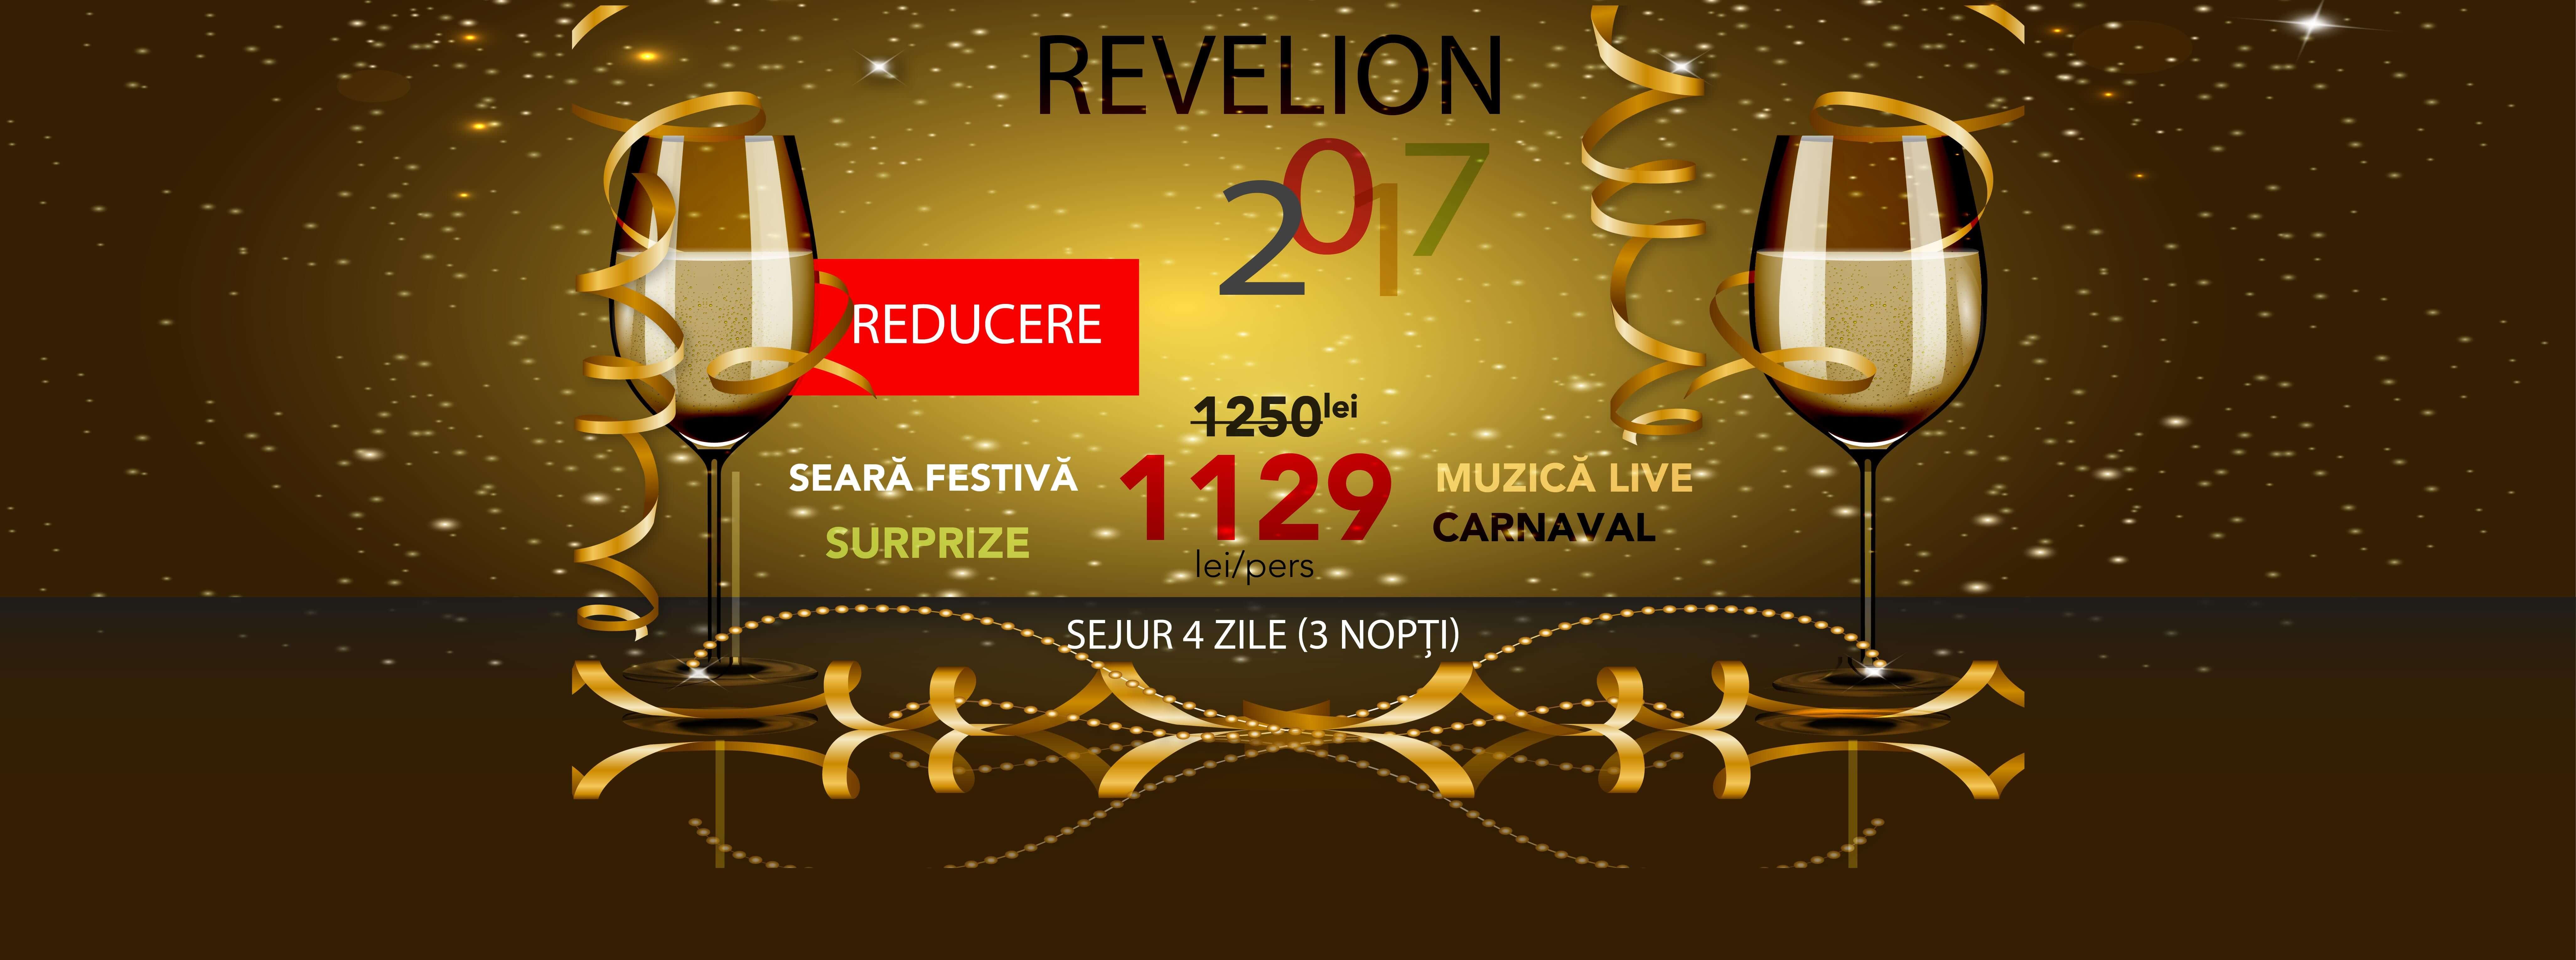 Revelion 2017 Hotel Roberto - Slanic